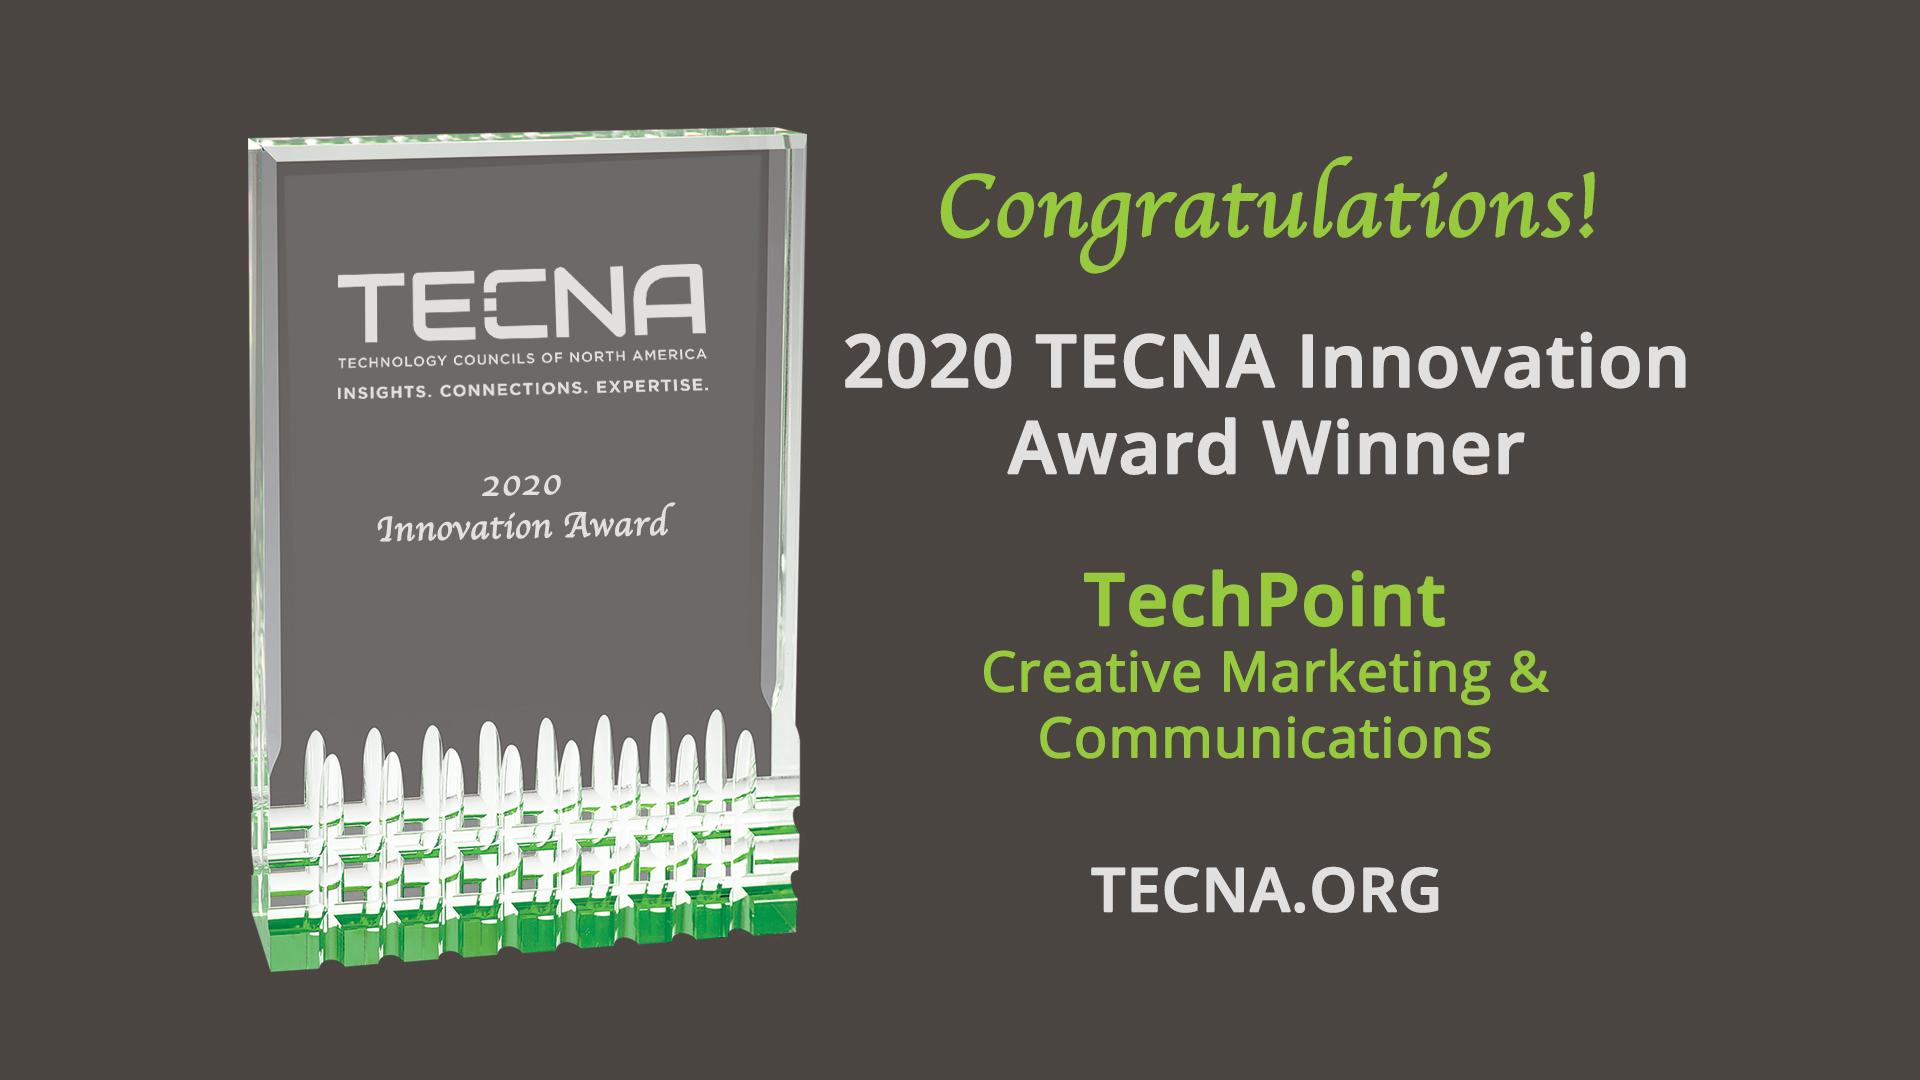 Innovation-Award-statue-slide---mktg-techpoint.jpg